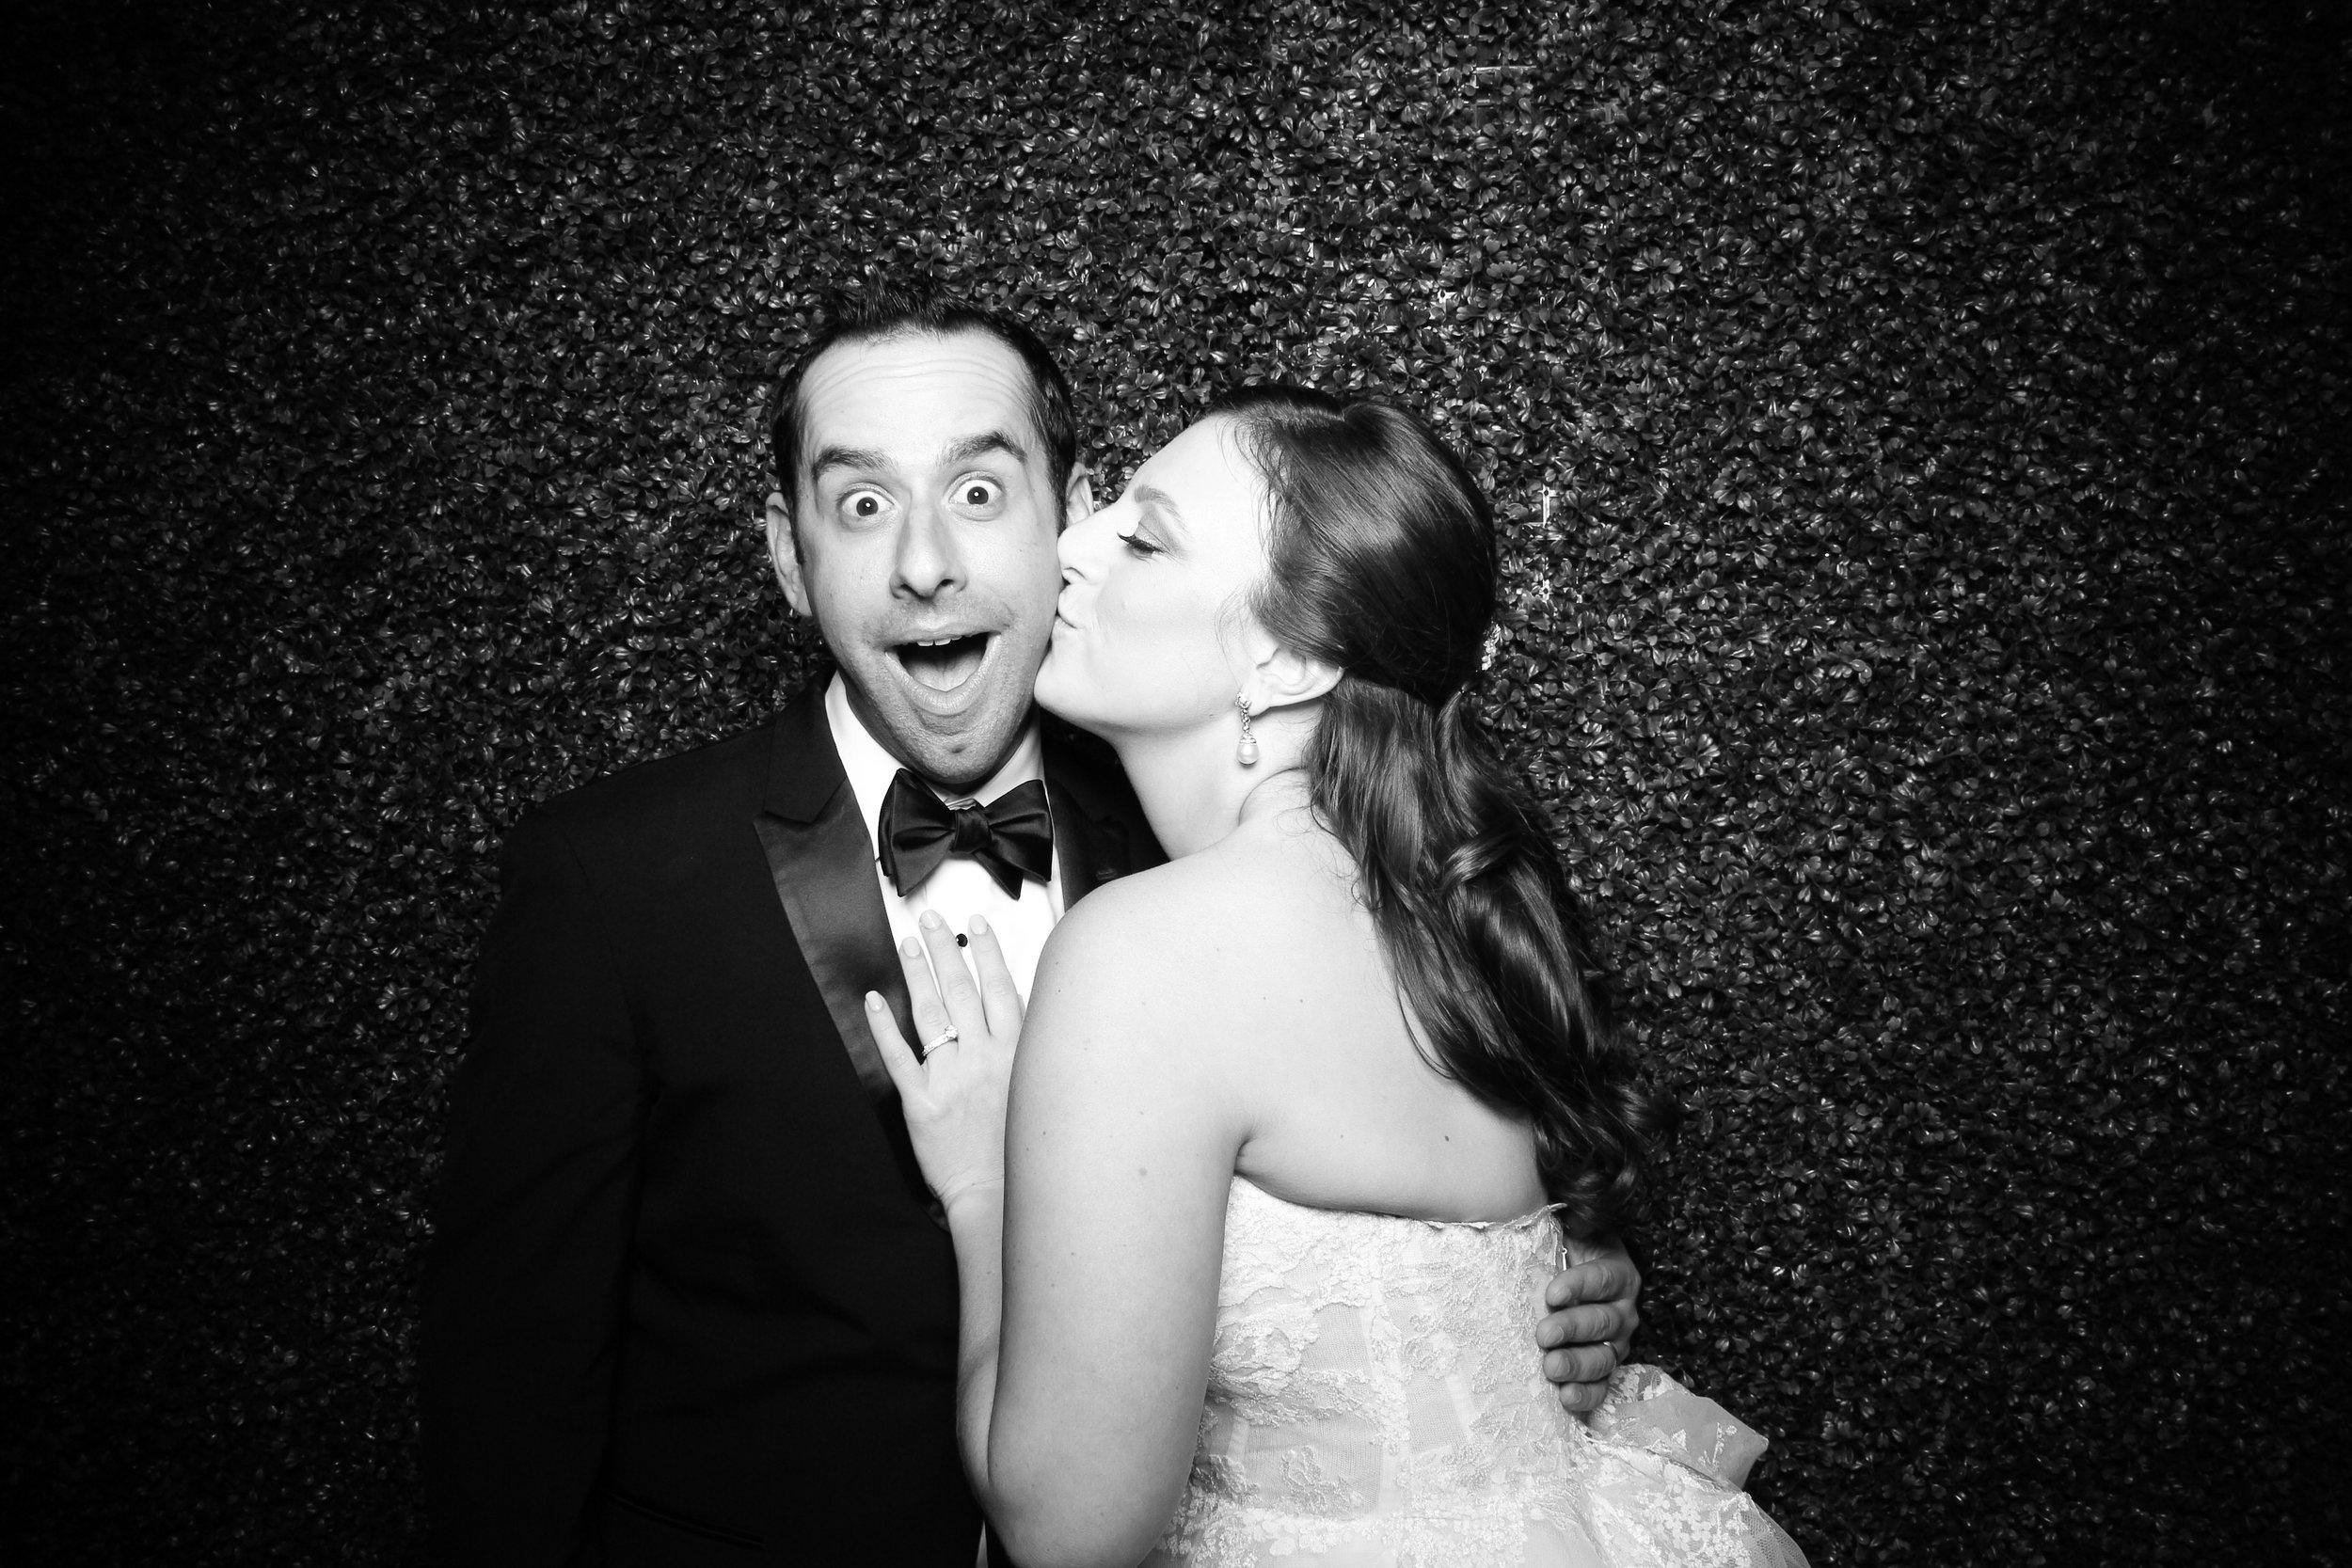 Ivy_Room_Chicago_Wedding_Reception_Photo_Booth_Rental__03.jpg